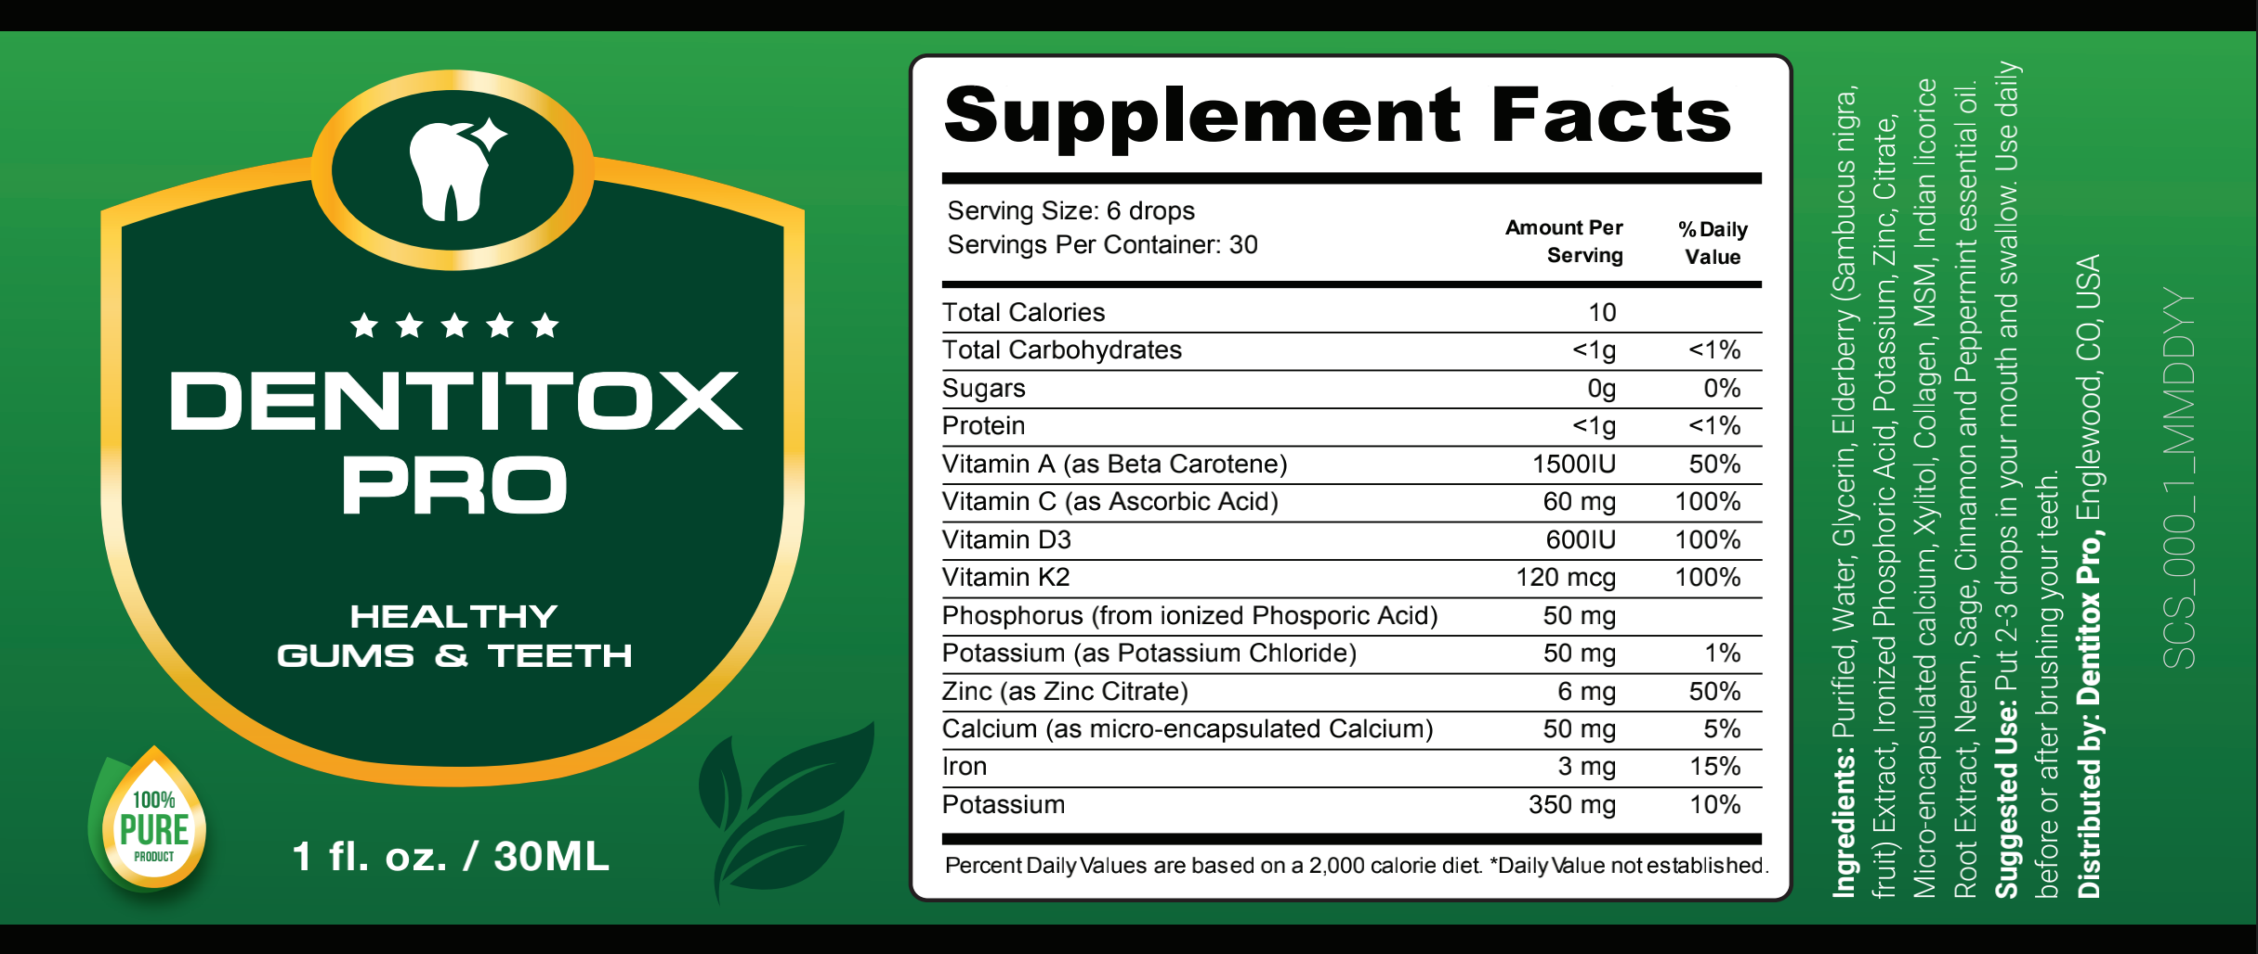 Dentitox Pro Drops Supplement Facts